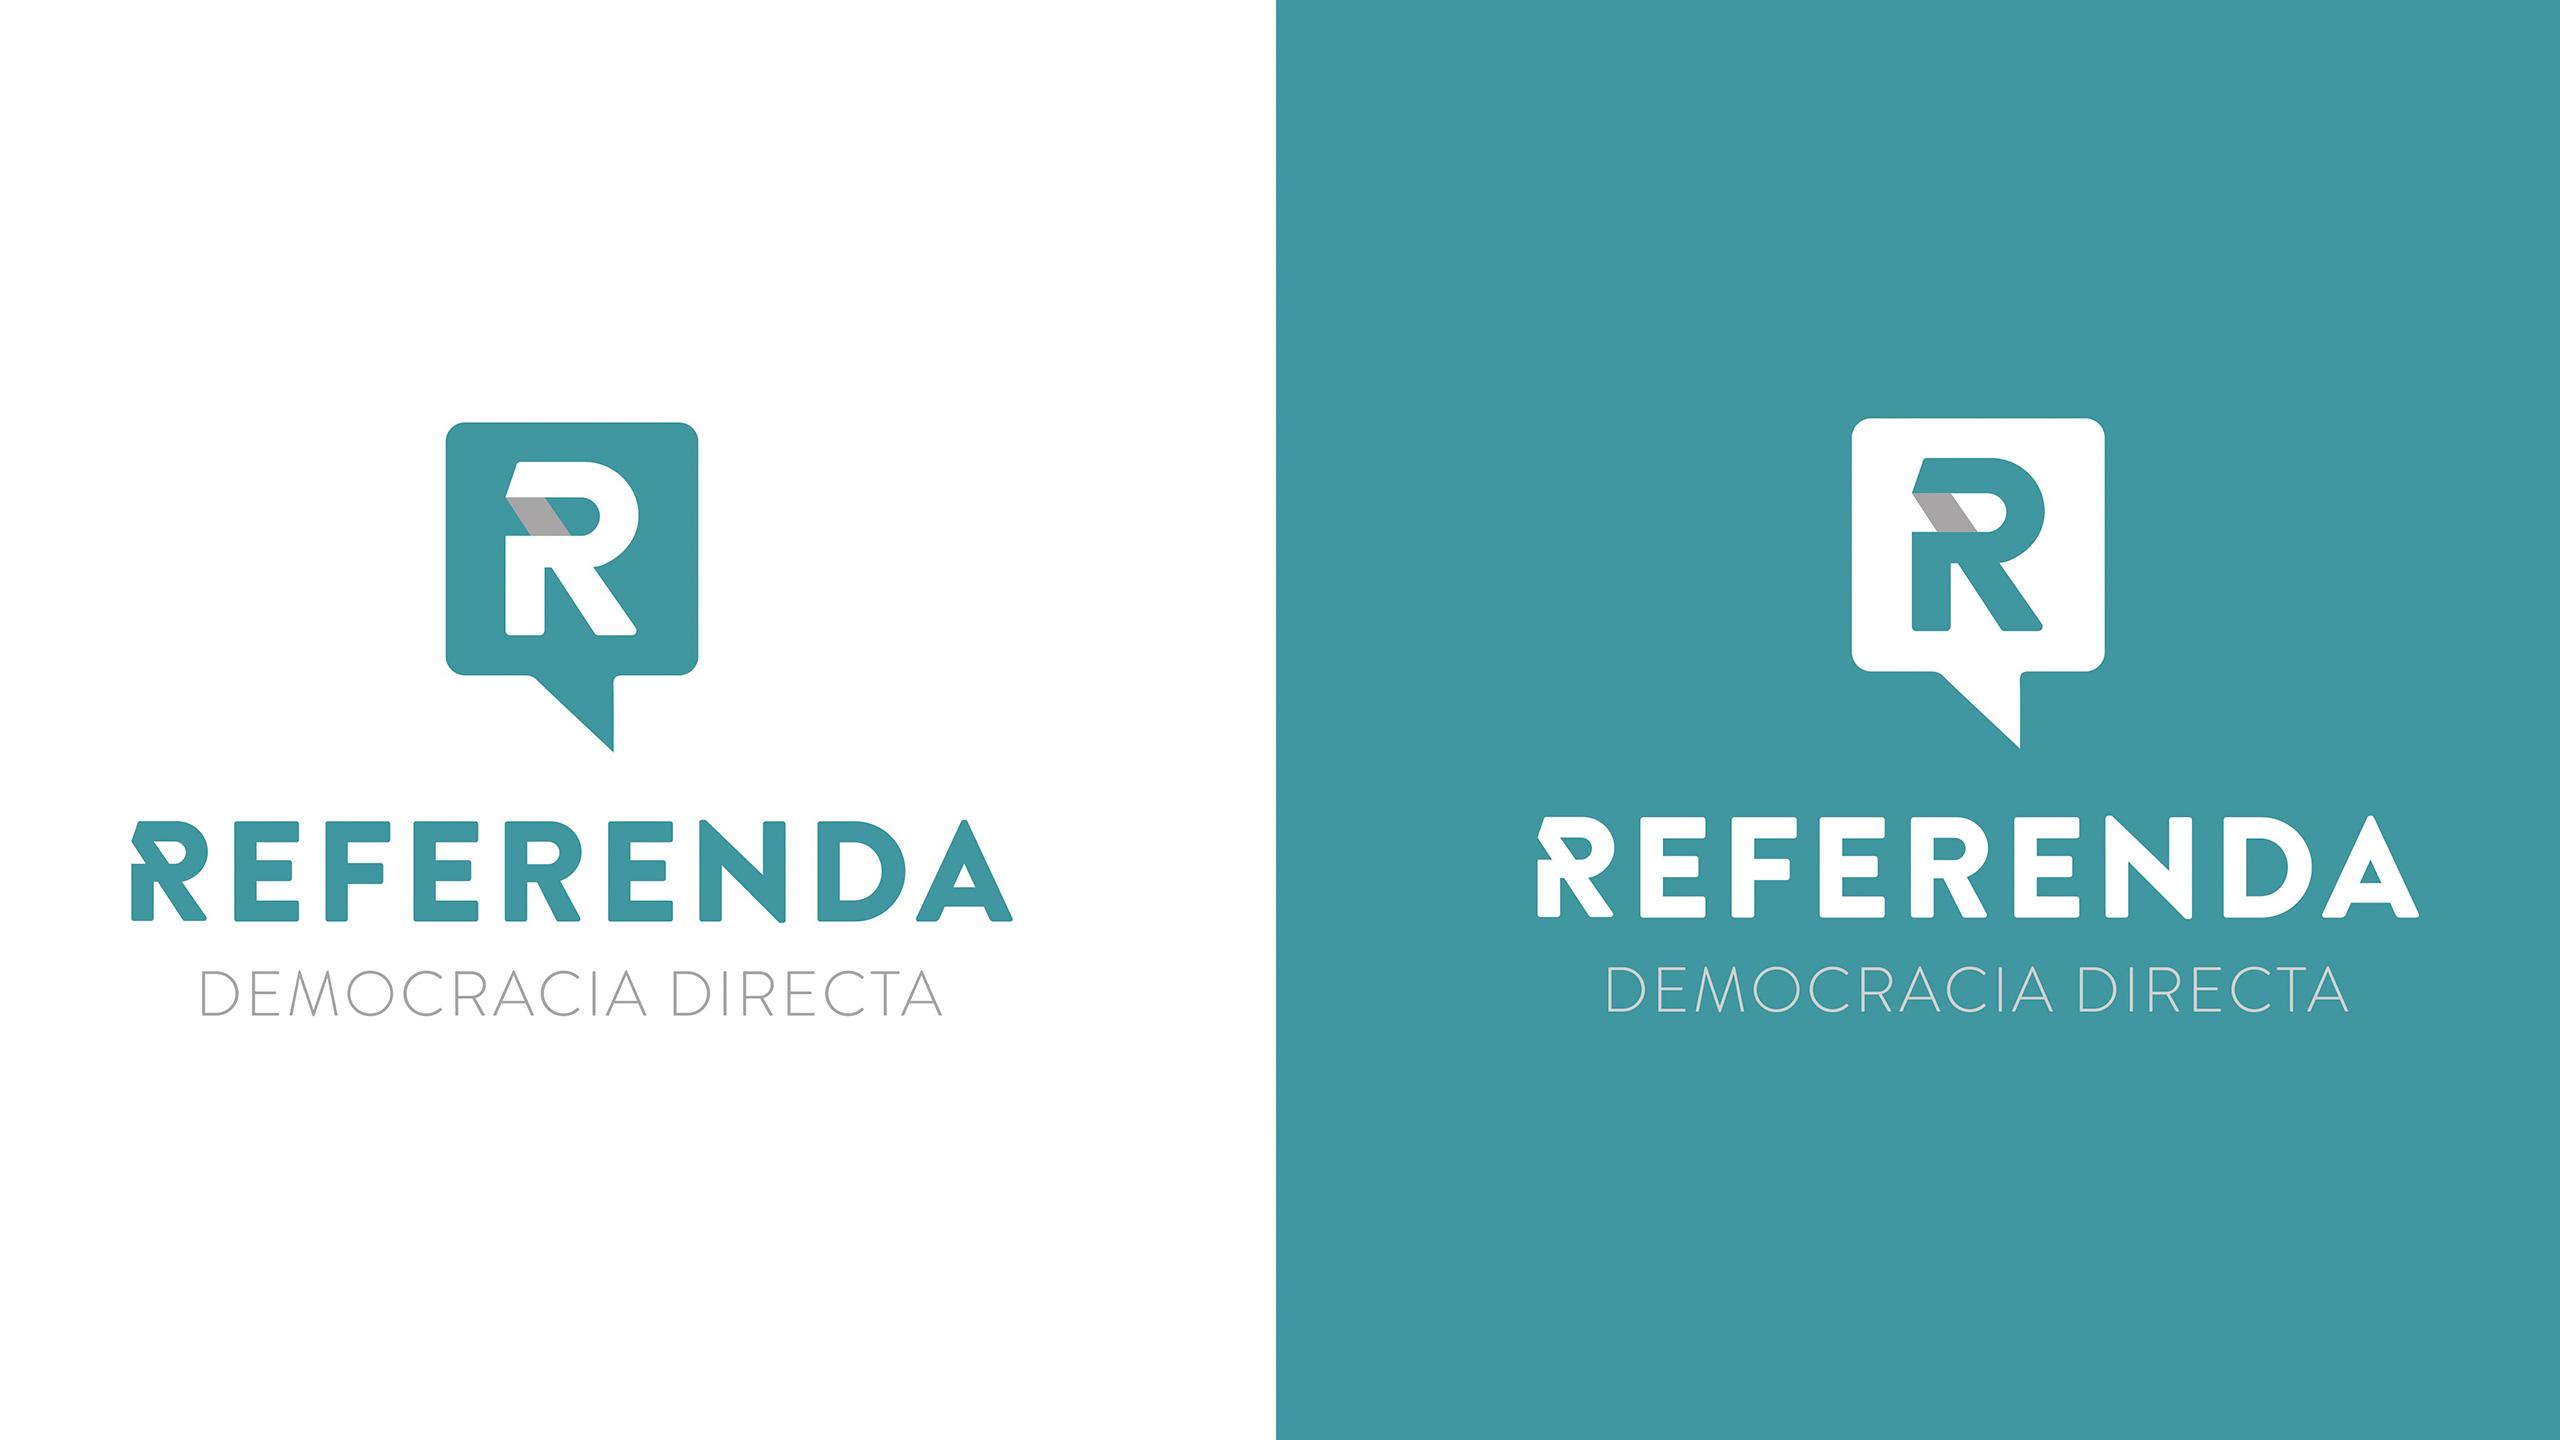 kamikaze_referenda_politica_logotipo_design_03_